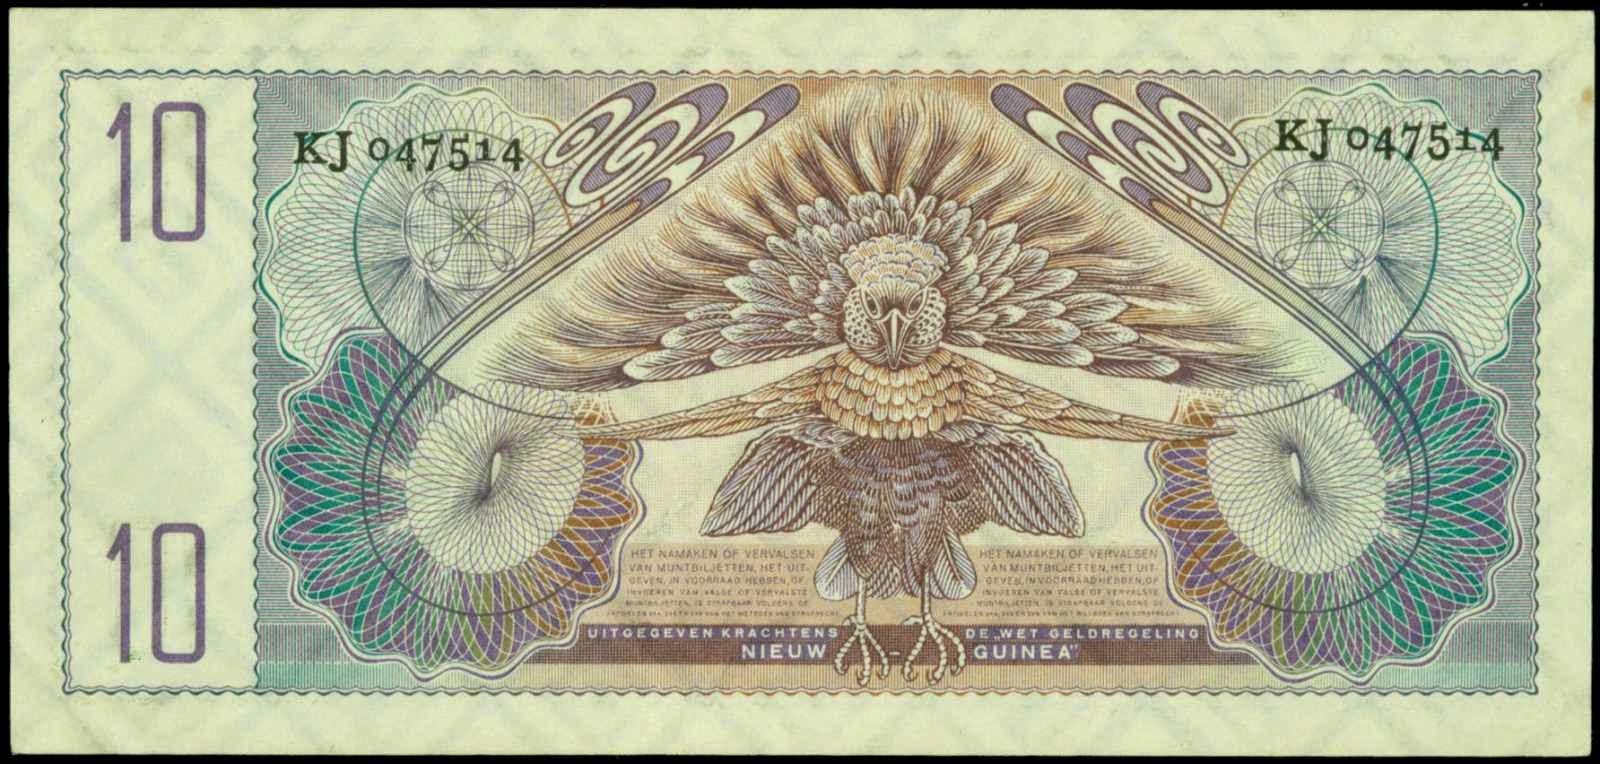 Netherlands New Guinea paper money 10 Gulden bank note 1954